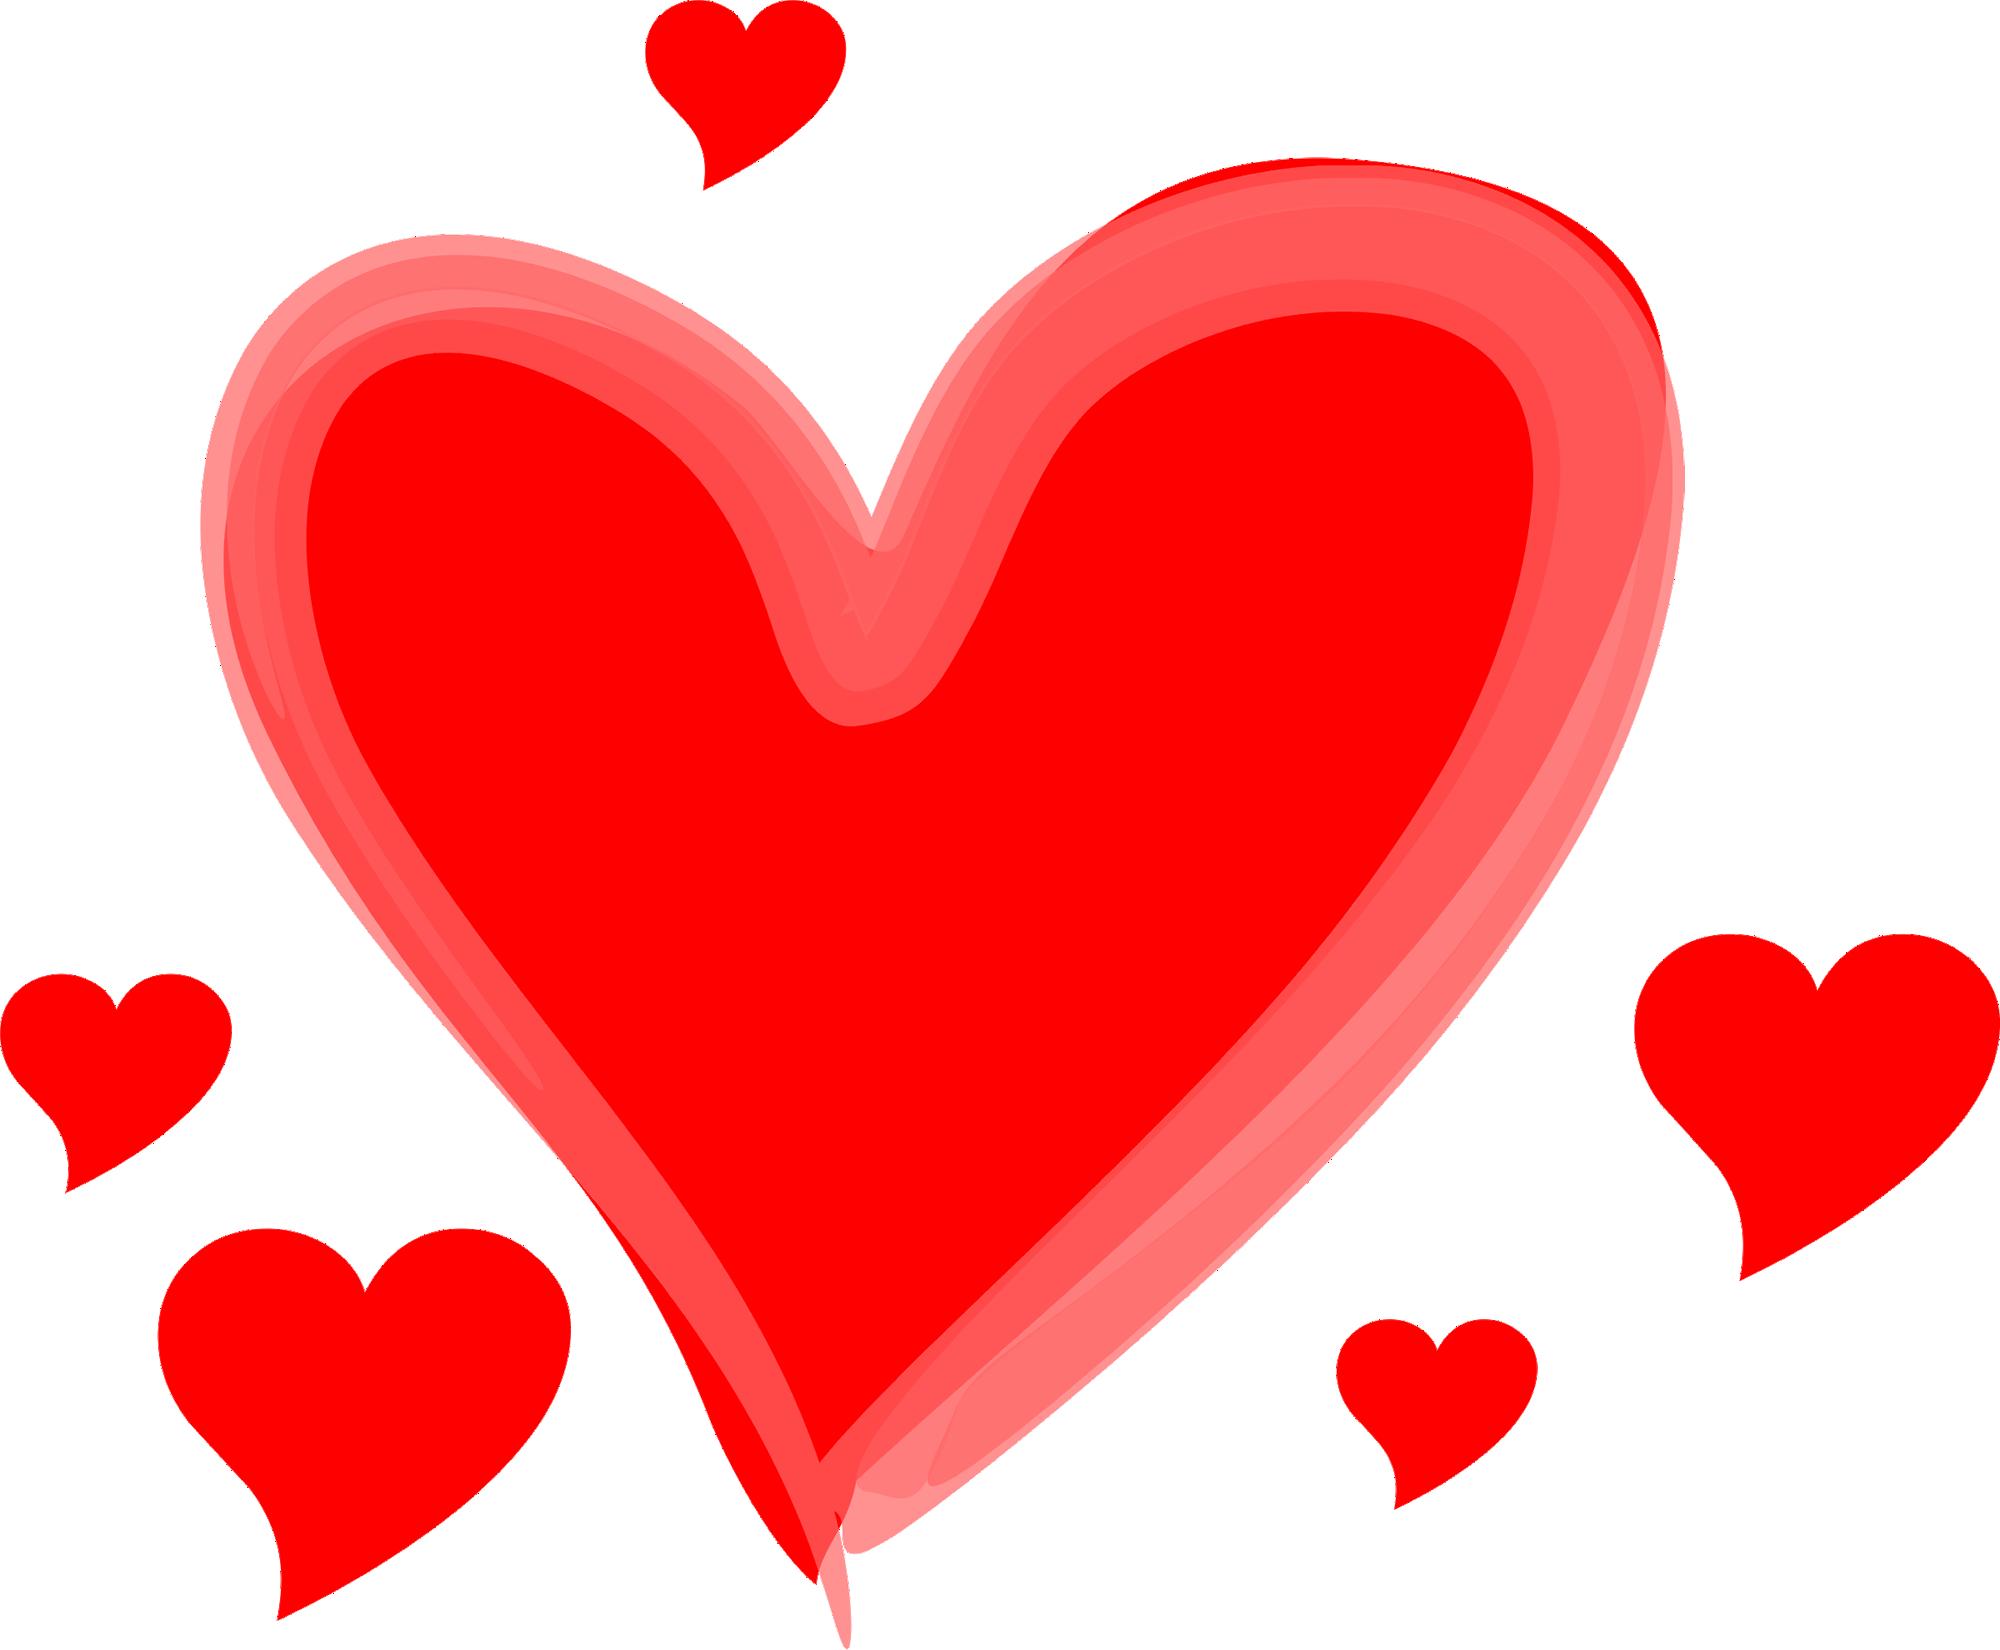 Heart Png - 1000 pics - Heart HD PNG